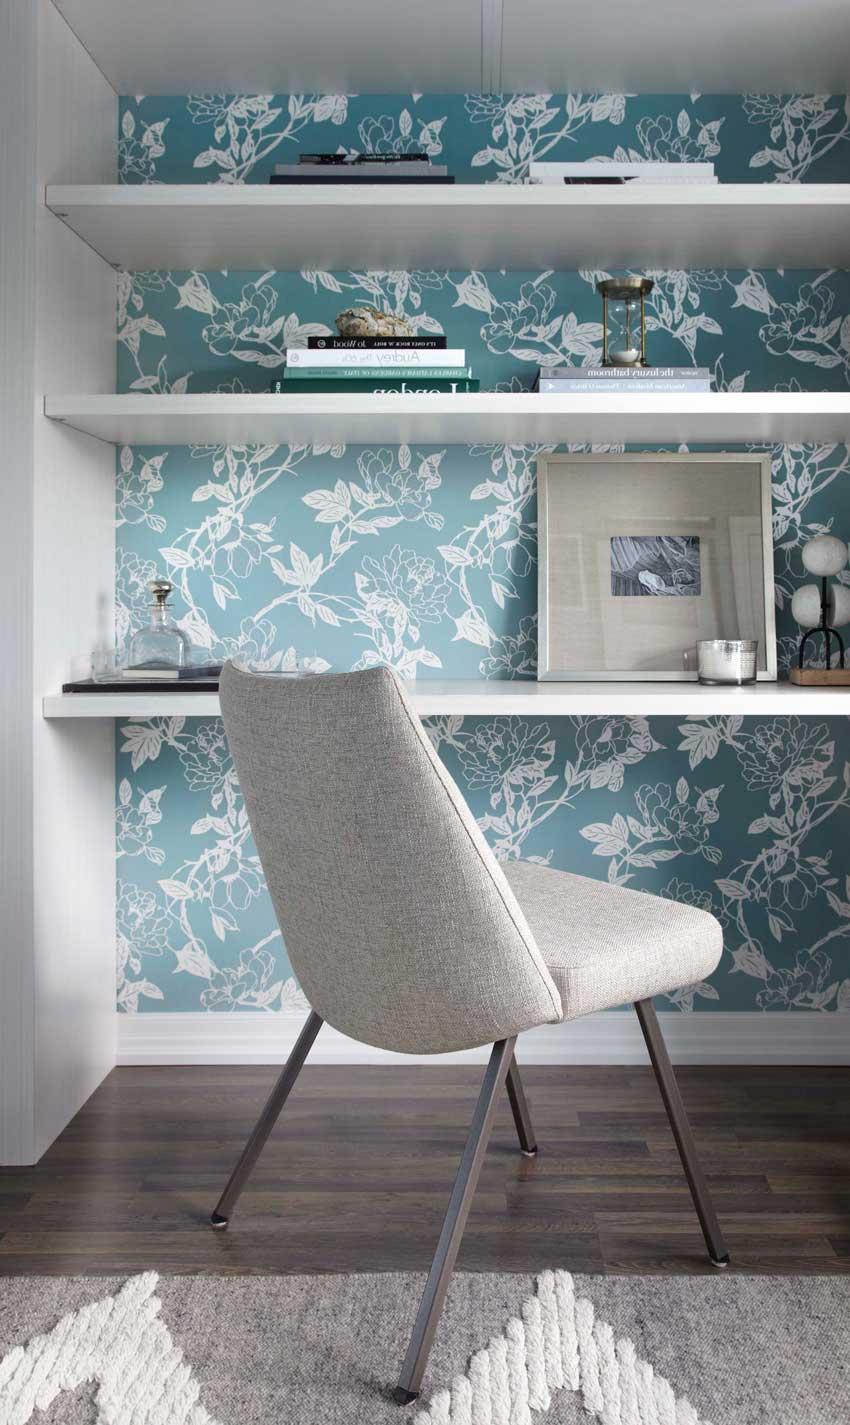 Contact us lux interior design for Lux home design